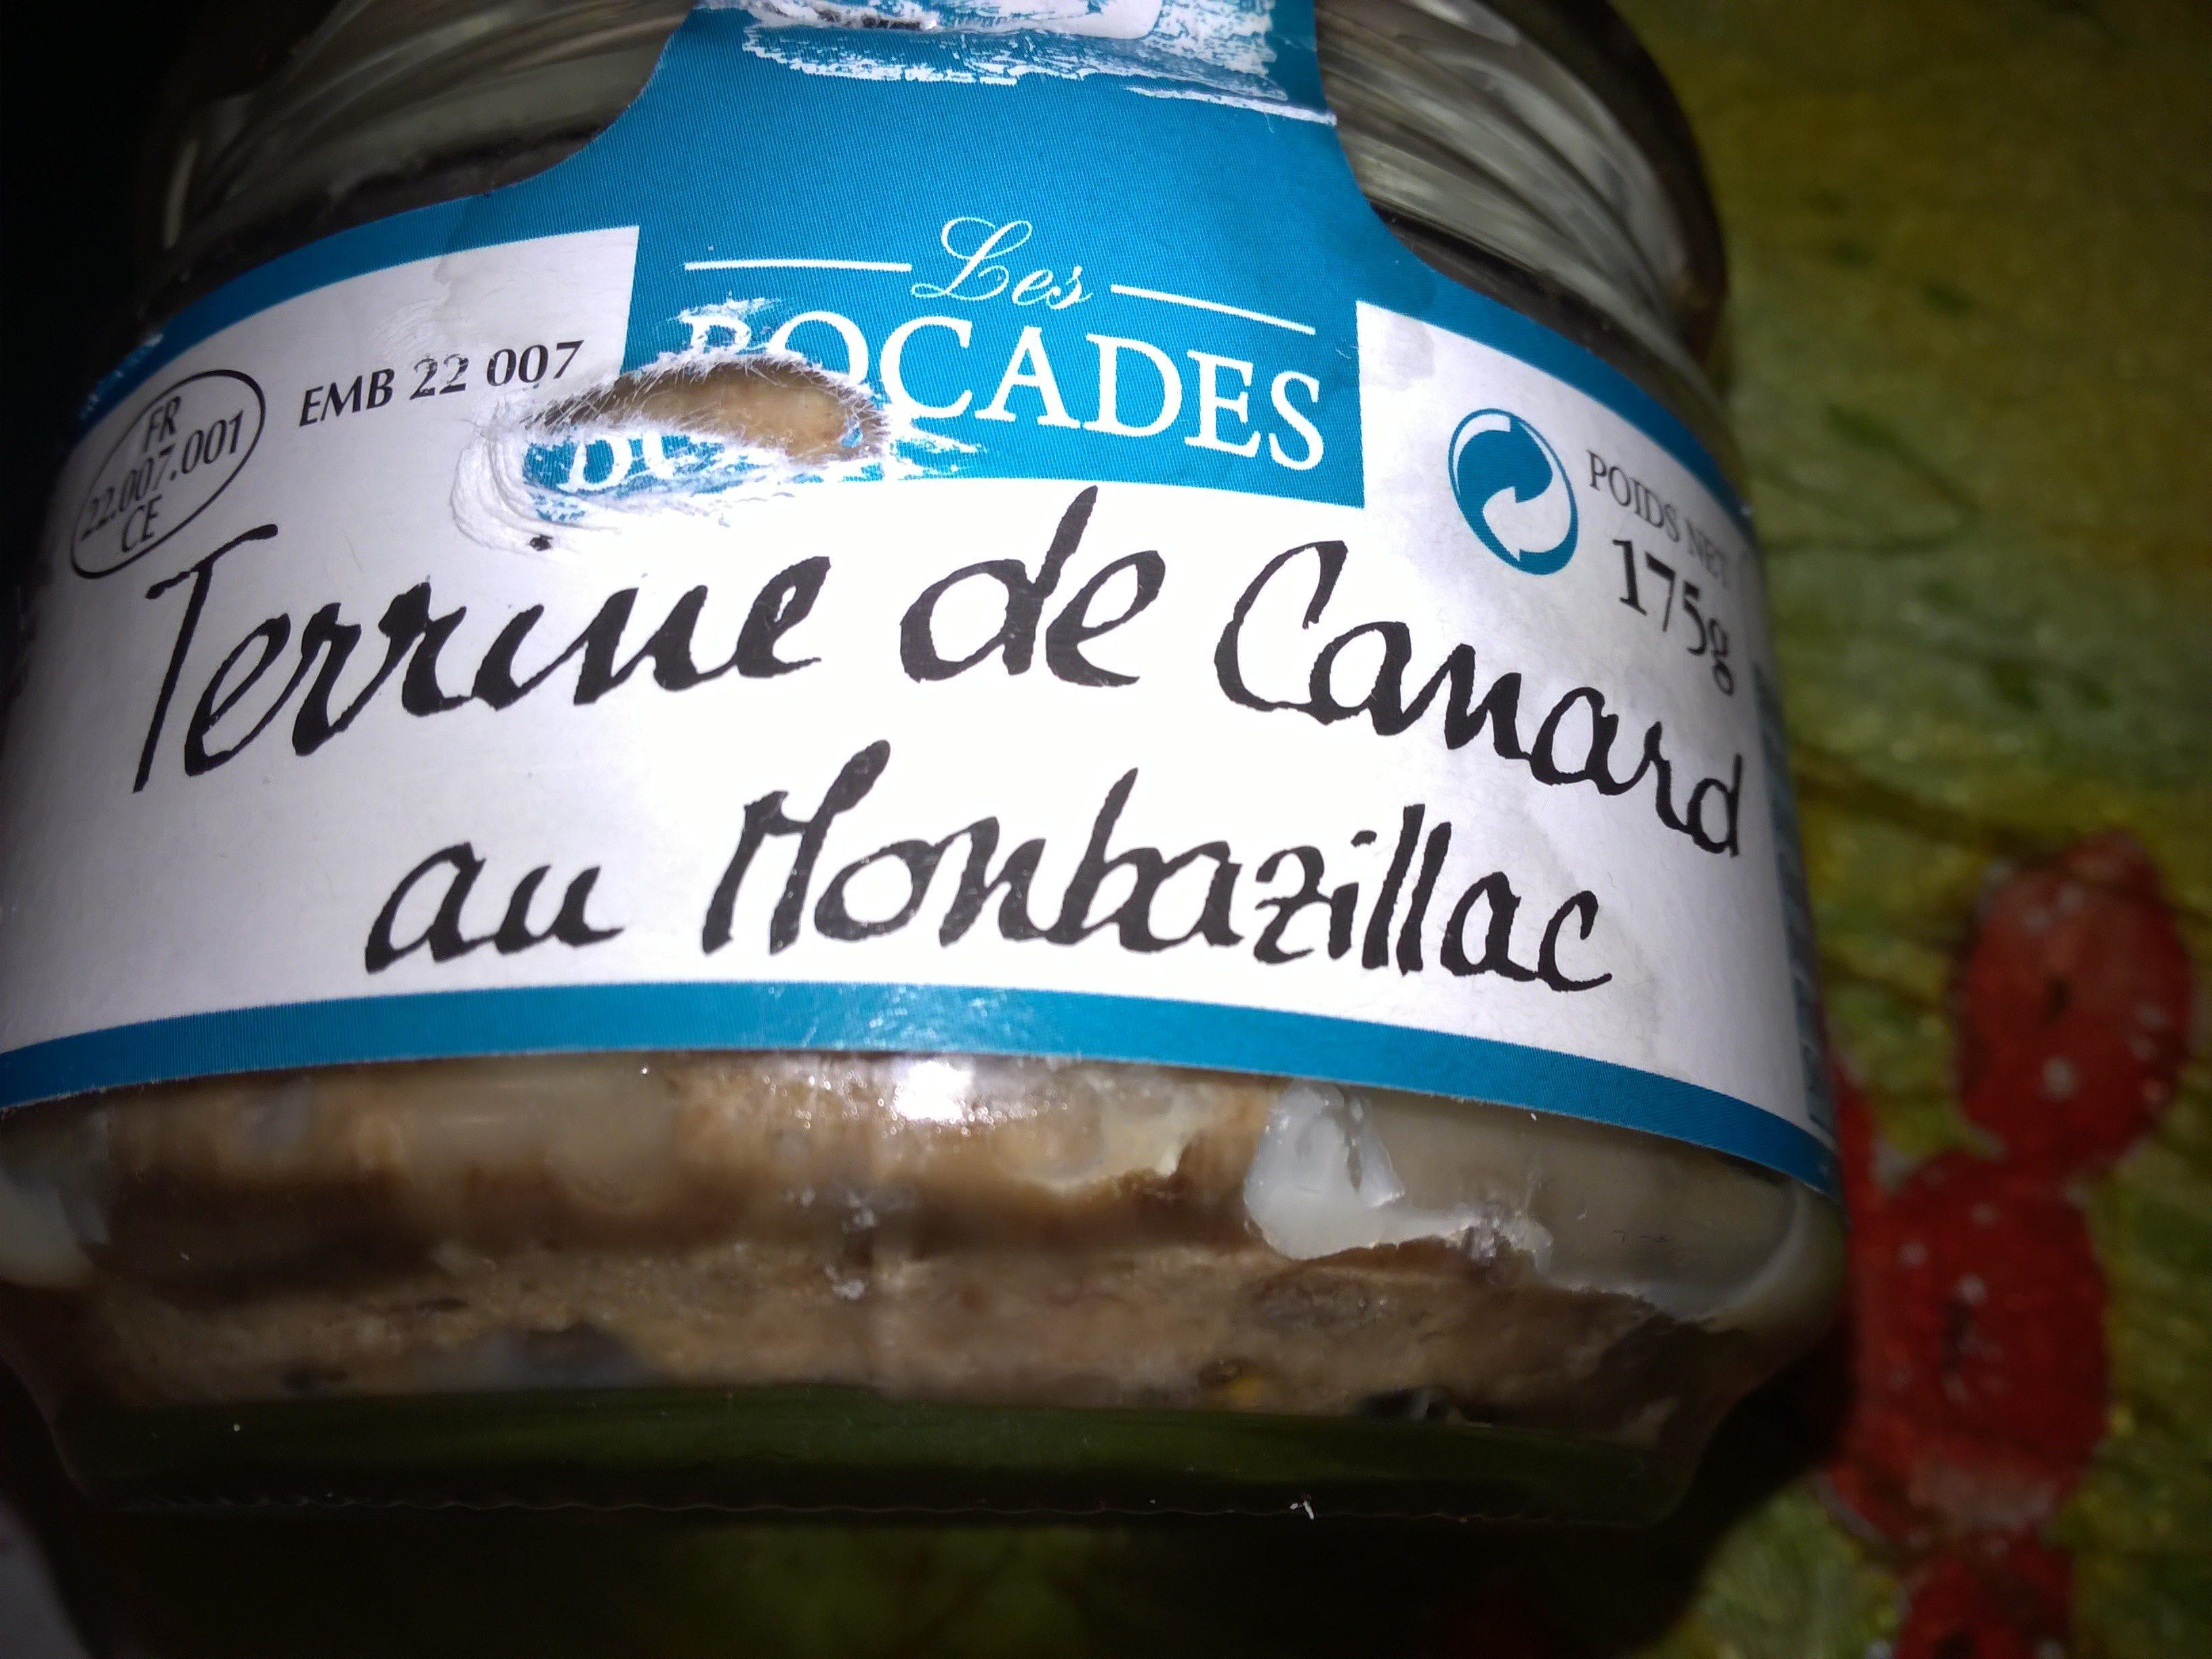 Terrine de Canard au Monbazillac - Product - fr